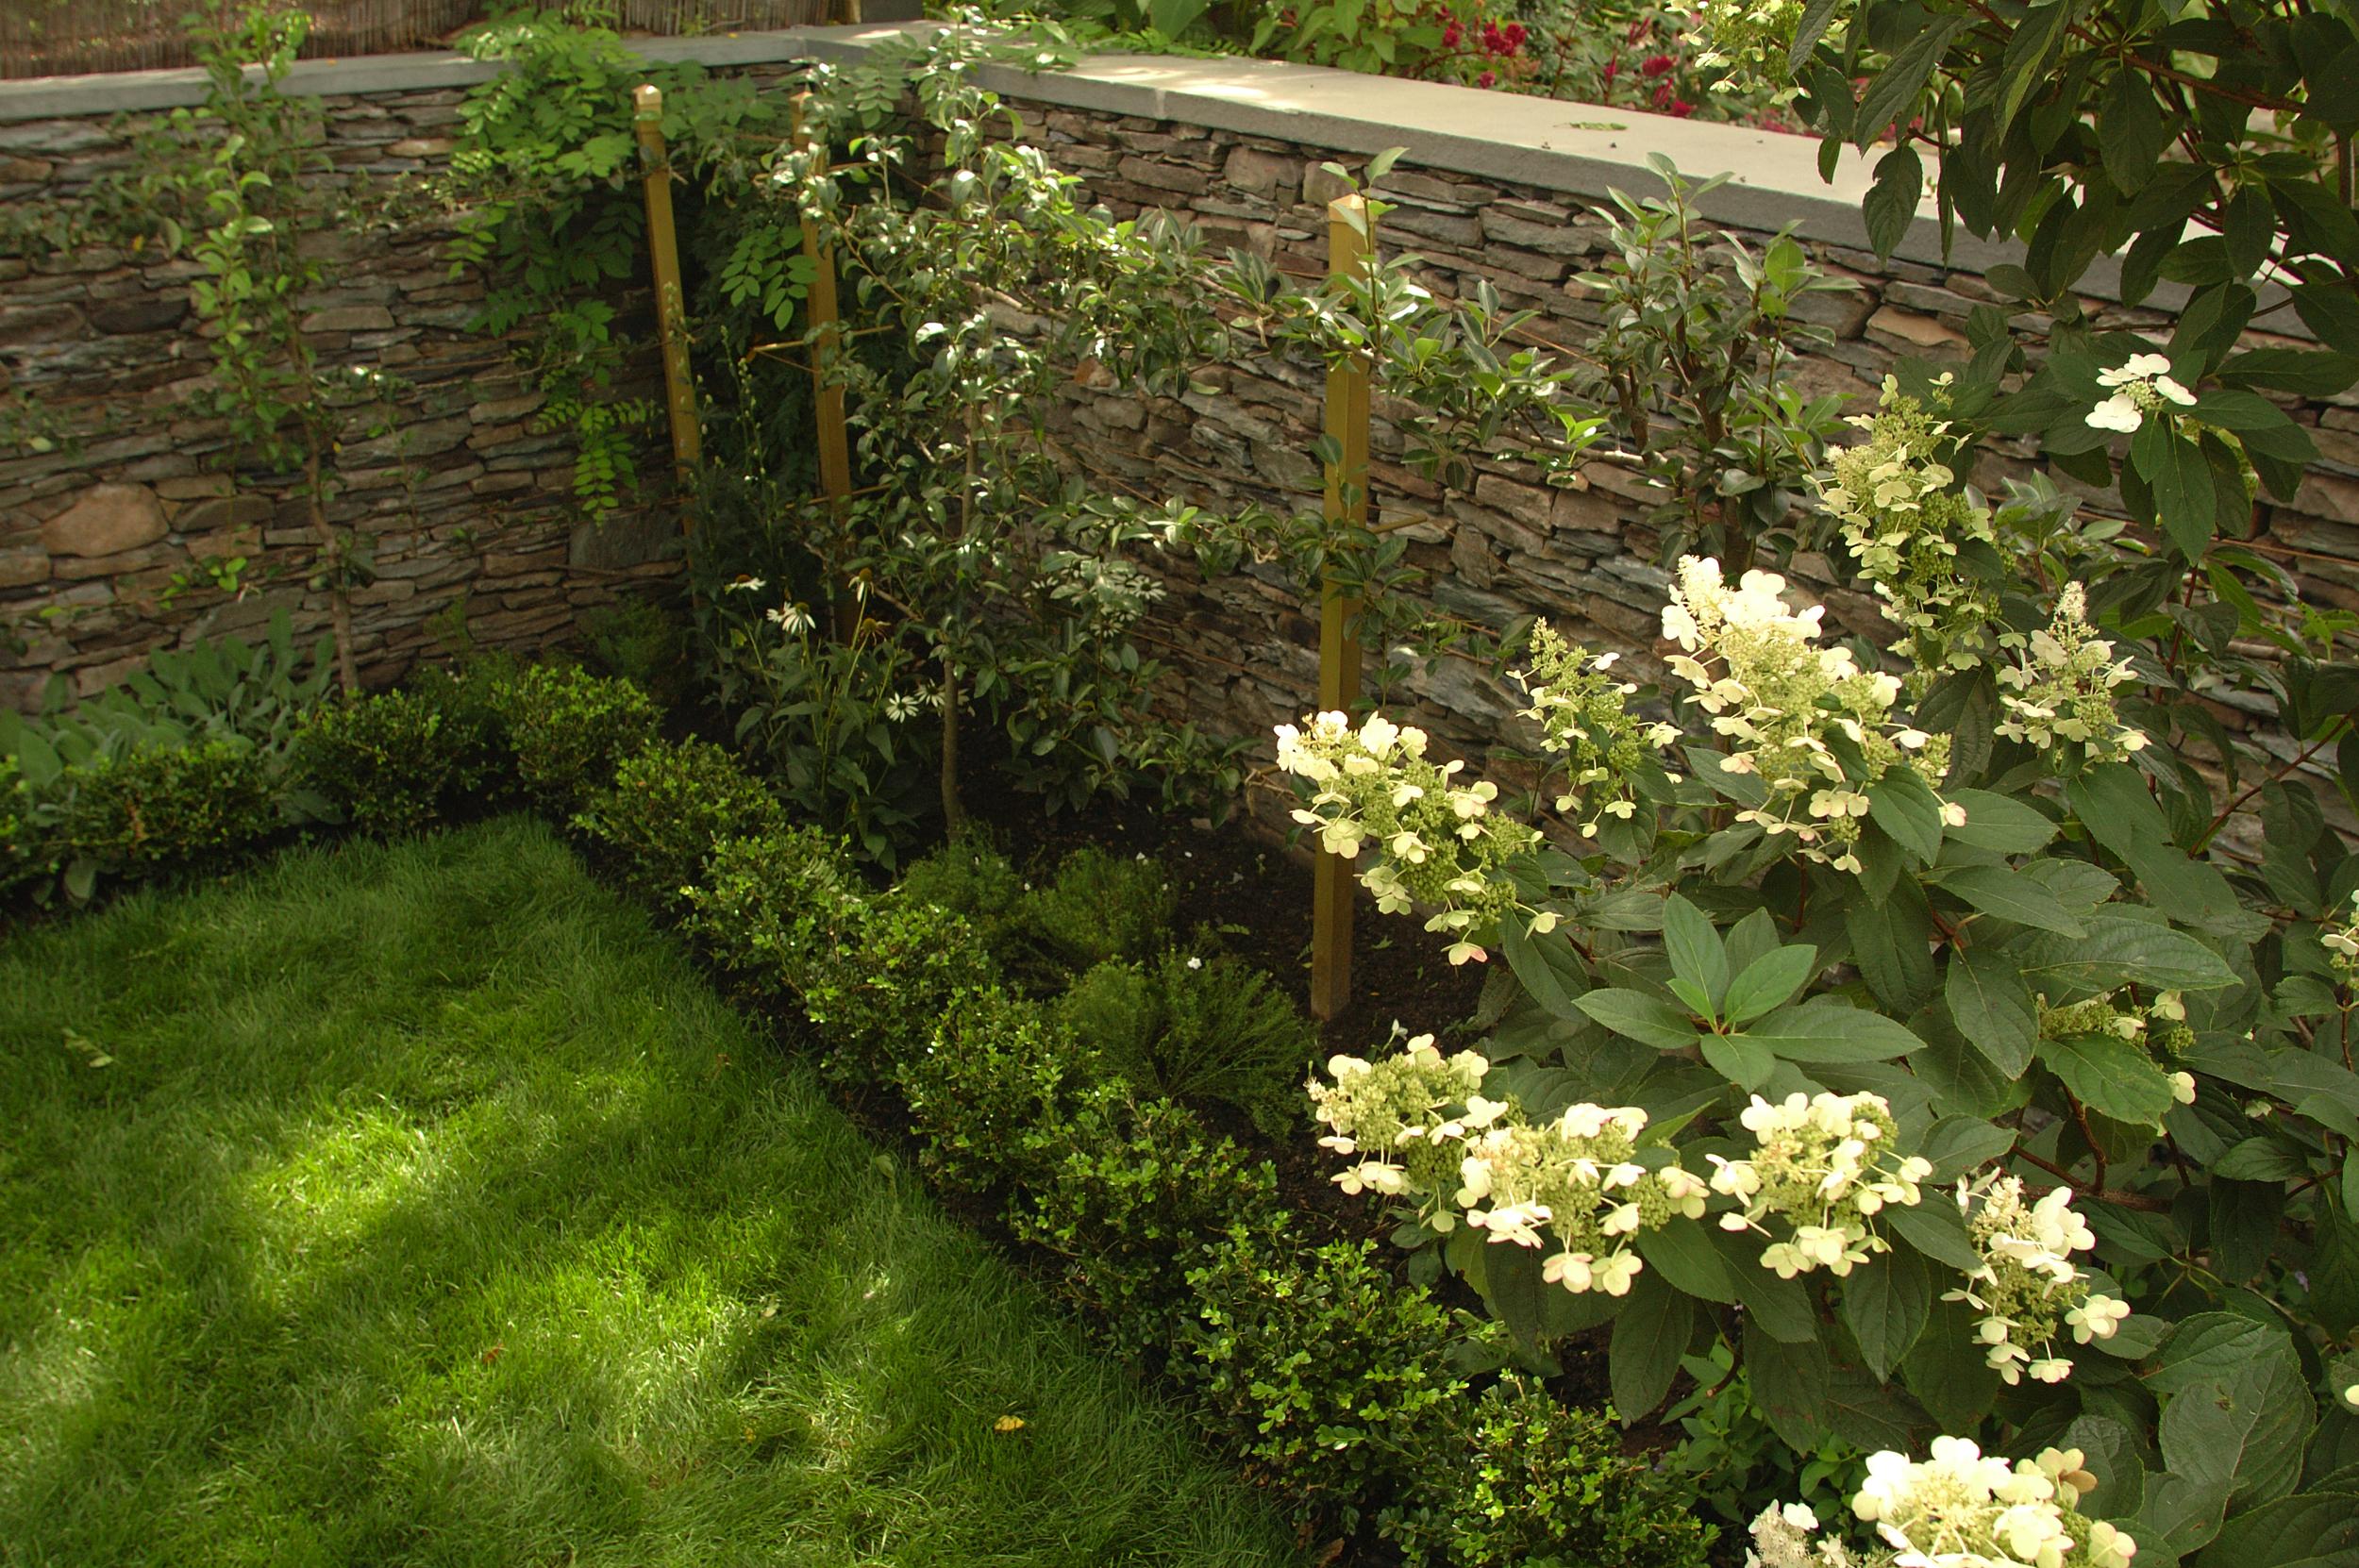 BA_Newport Garden_1_Mary Beth Meehan.jpg